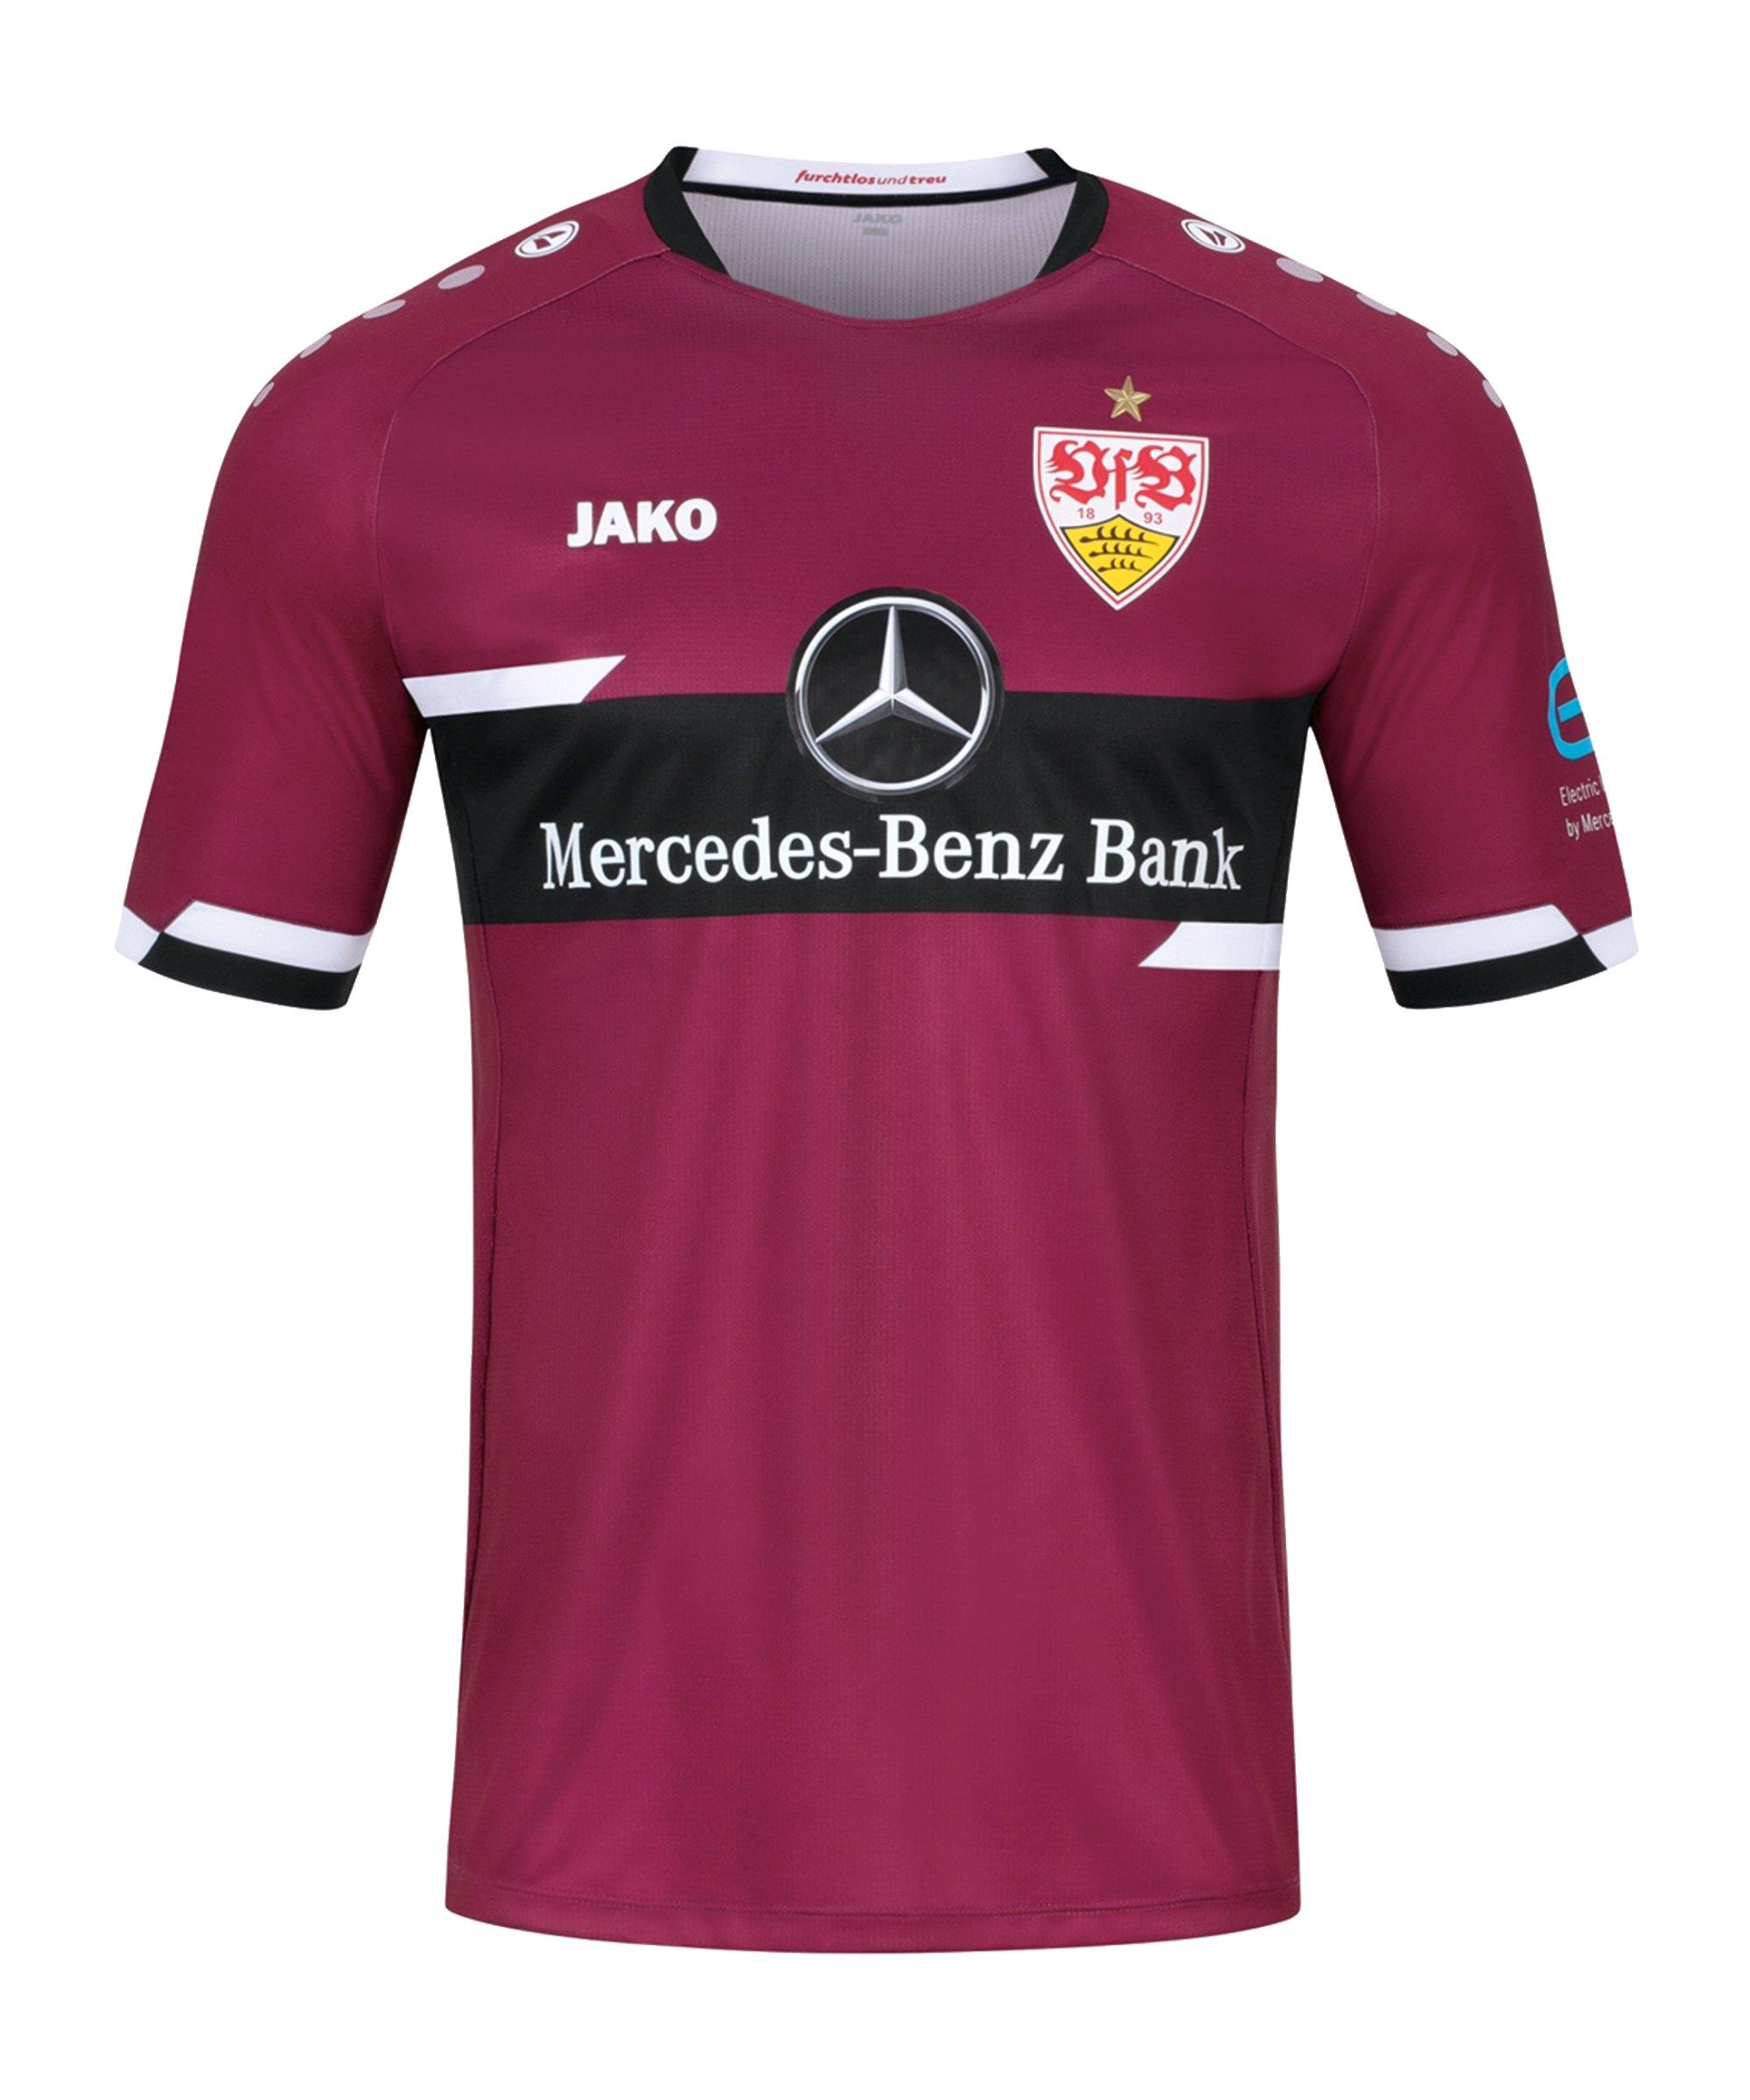 JAKO VfB Stuttgart TW-Trikot Away 2021/2022 Kids Lila F612 - rot